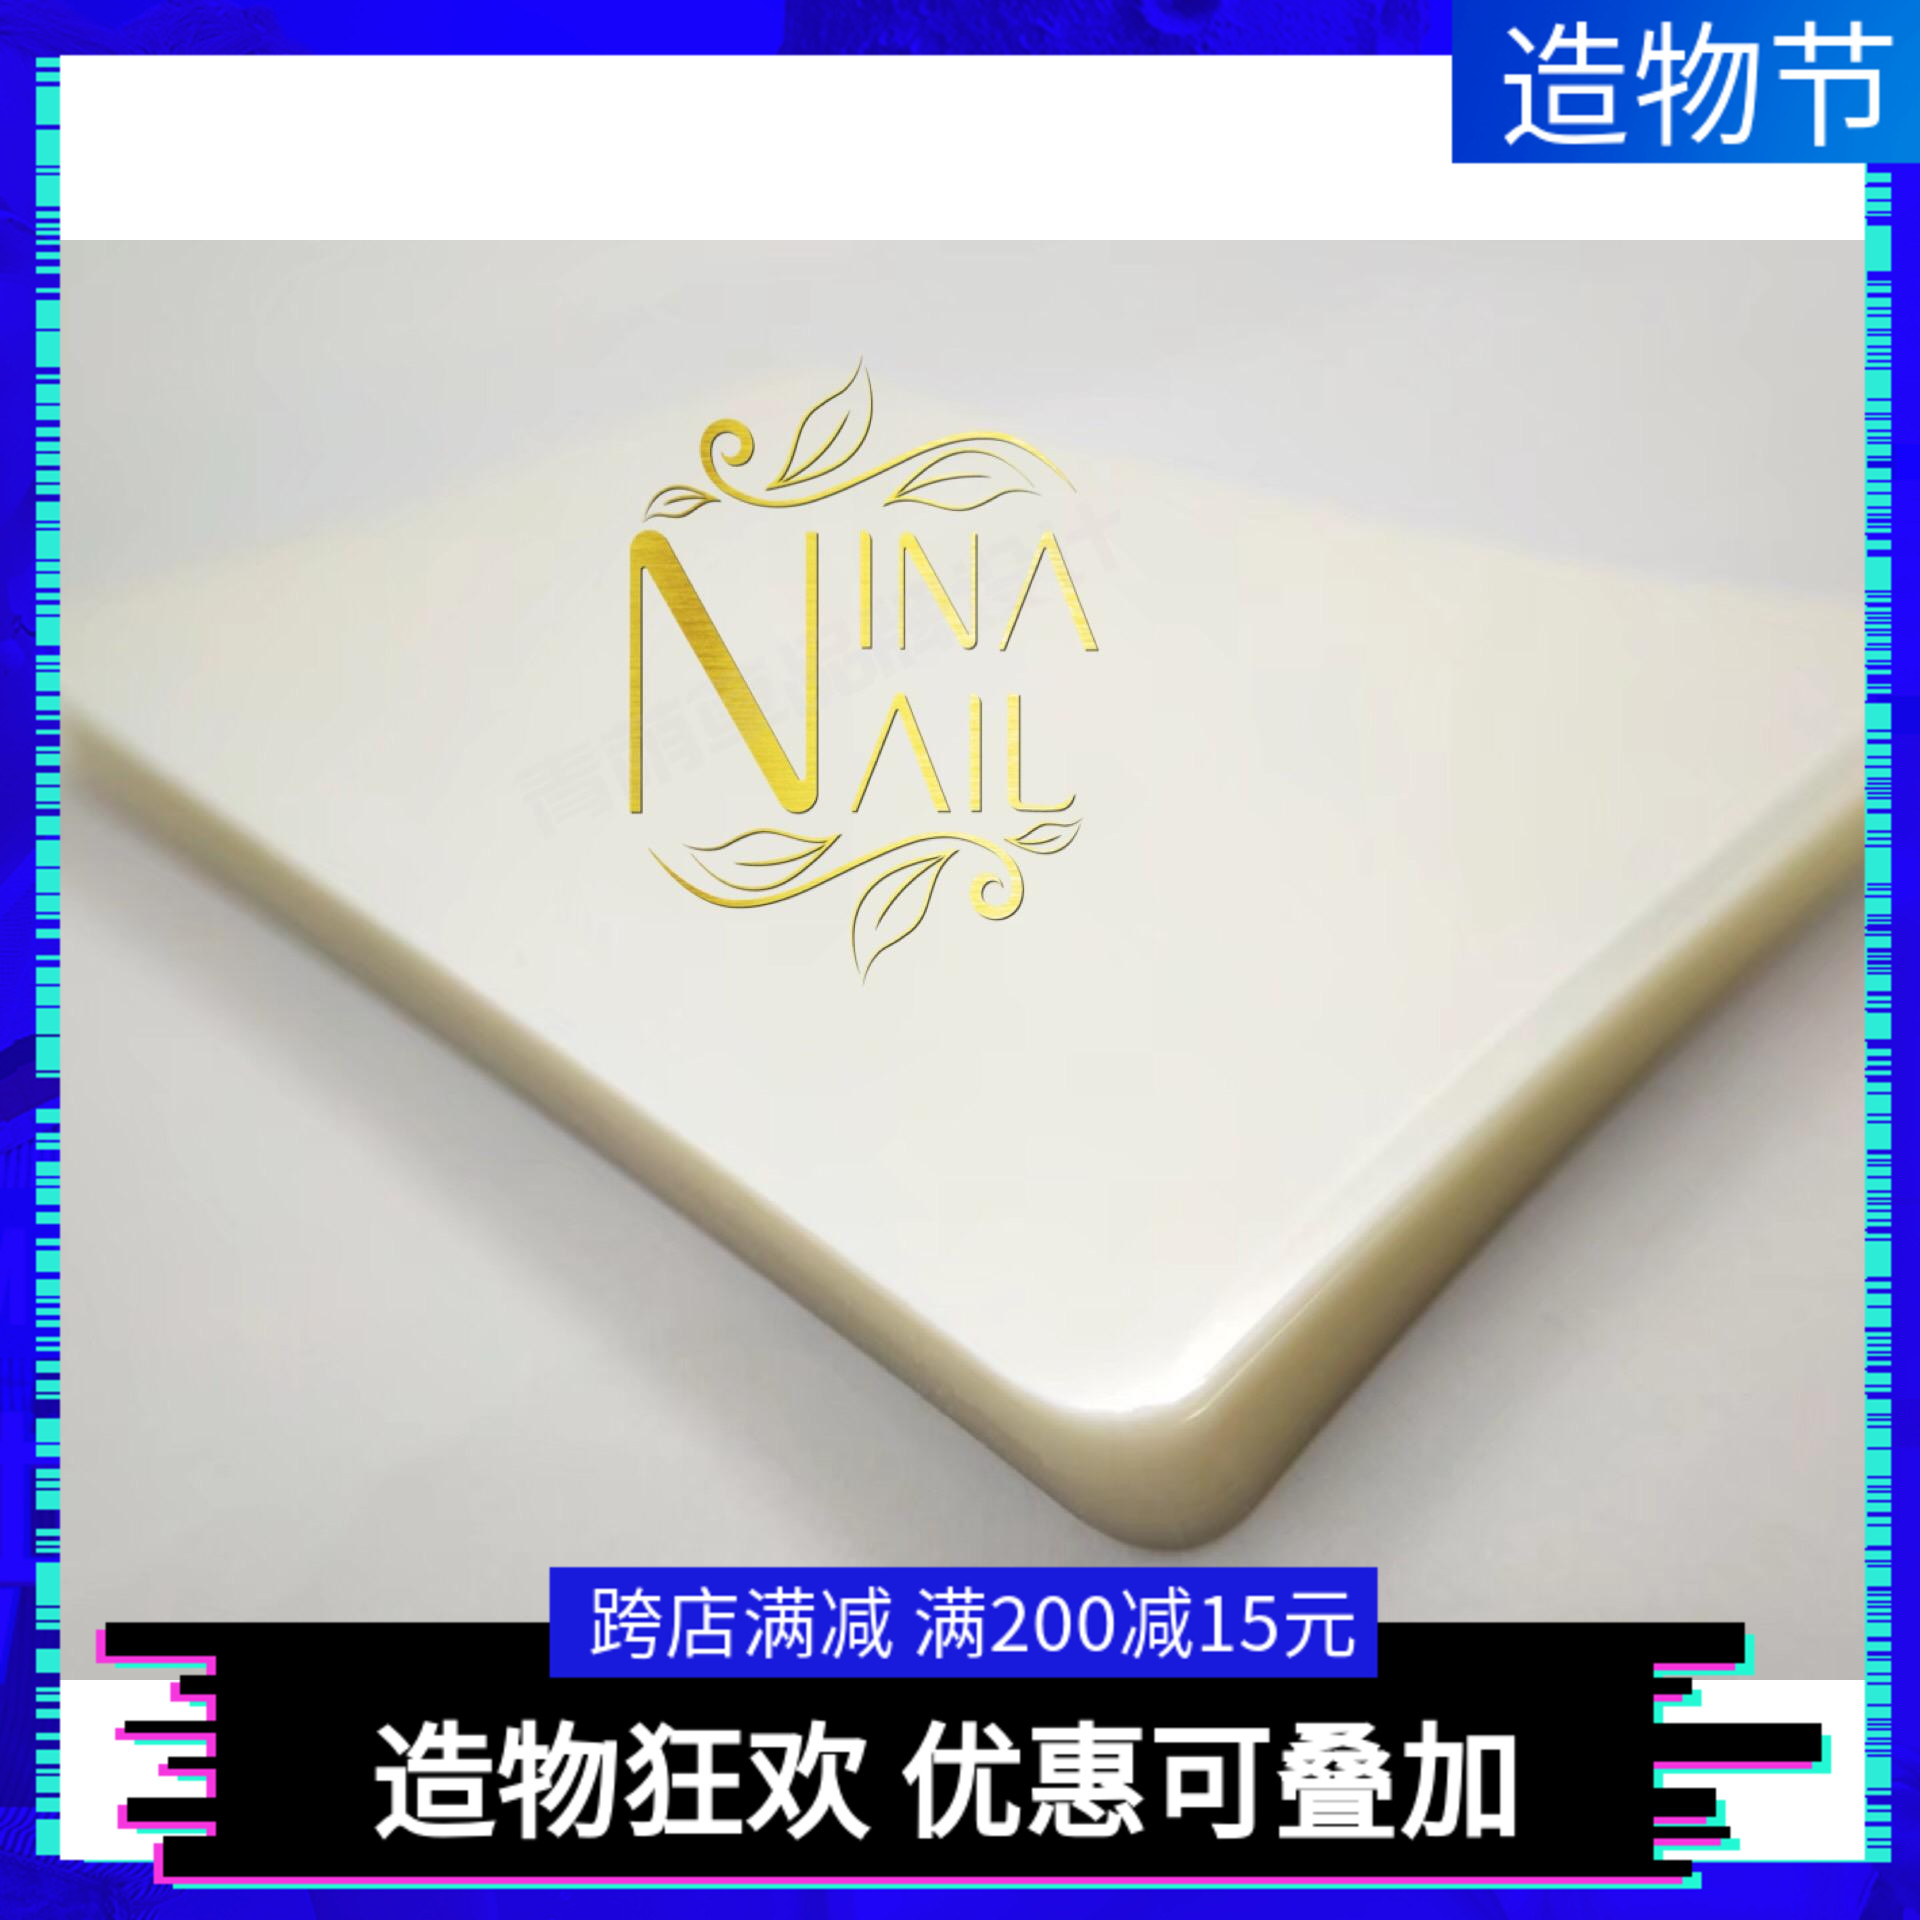 Nina Nail 可代替美甲一次性调色纸 调胶纸 200张 美甲工具